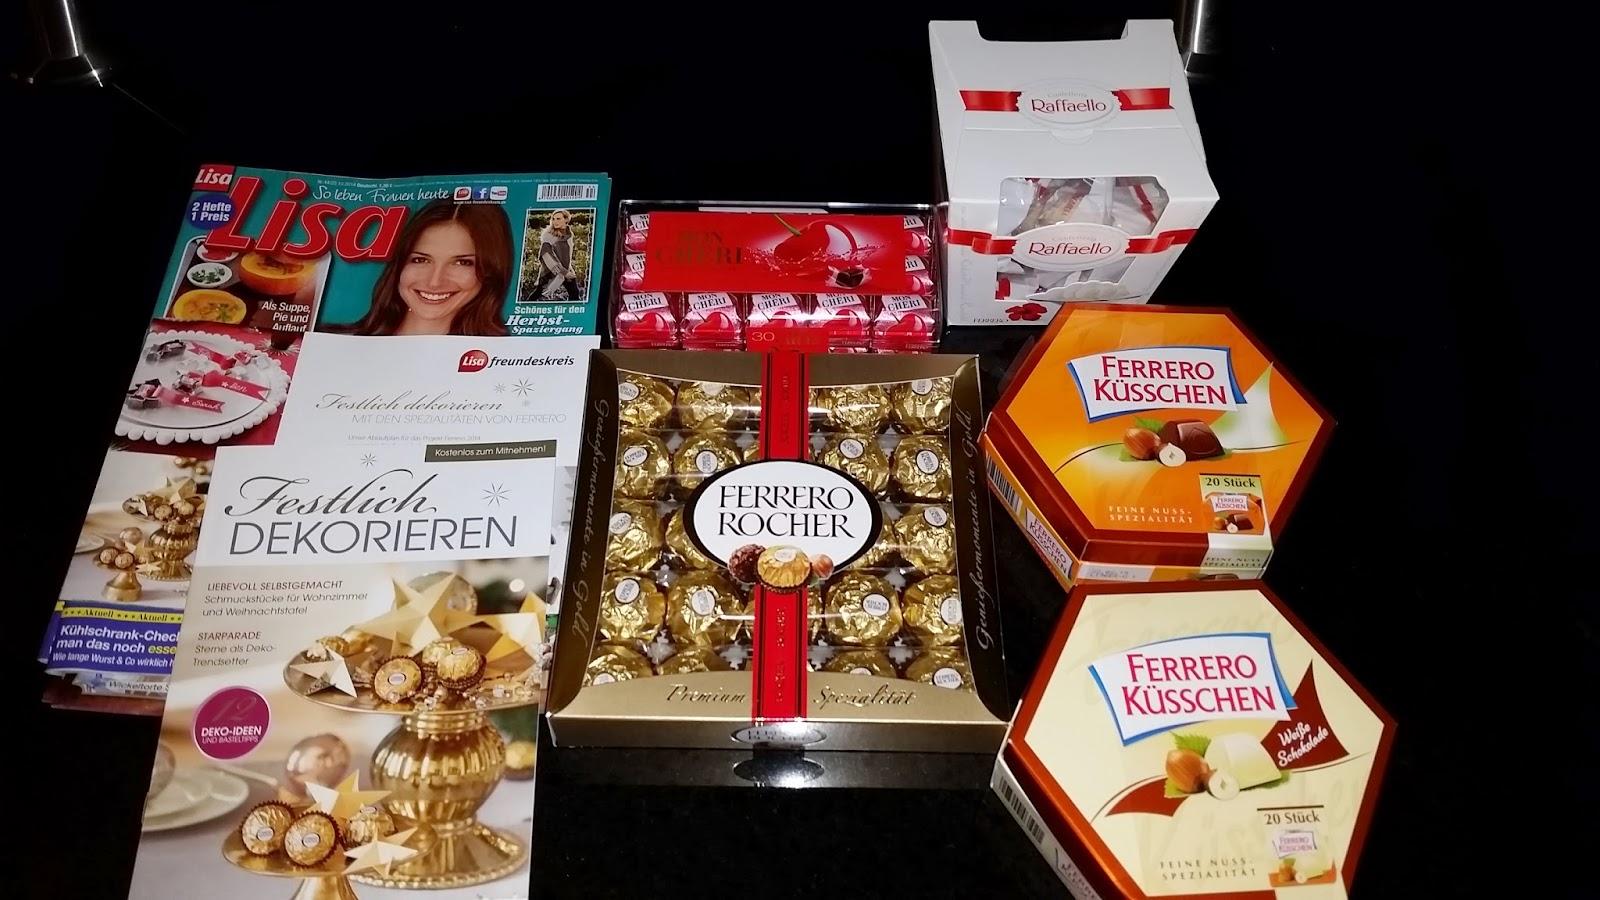 Weihnachtsdeko Ferrero.Speisenundreisentest 31 10 14 Basteln Mit Ferrero